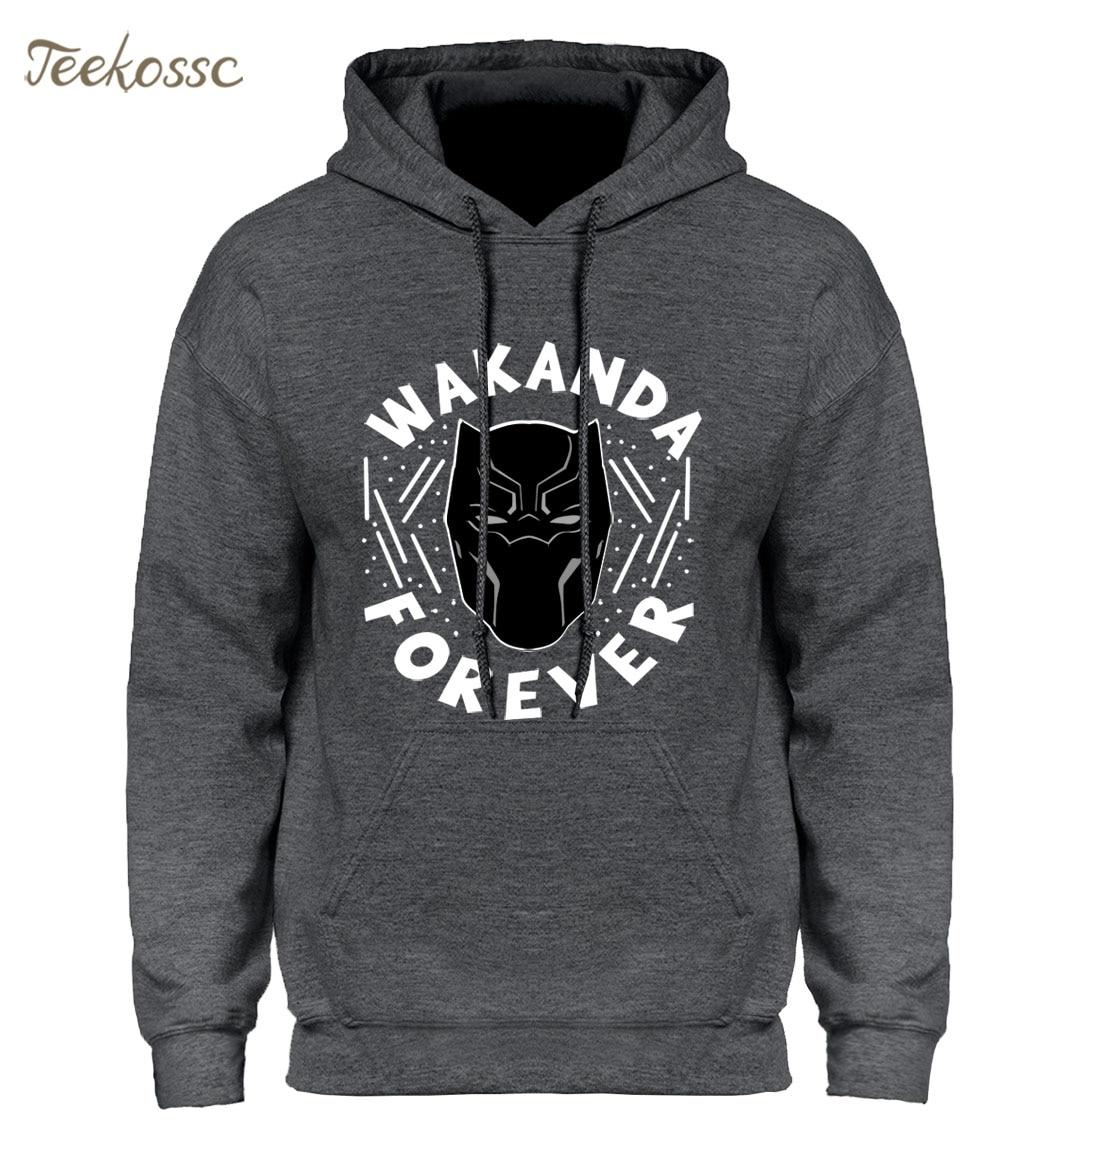 size 40 3e85d 0e656 US $10.24 42% OFF|Black Panther Hoodie Men Wakanda Forever Hoodies Mens  Killmonger Pullover Hooded Sweatshirt Harajuku Fleece Hip Hop Streetwear-in  ...